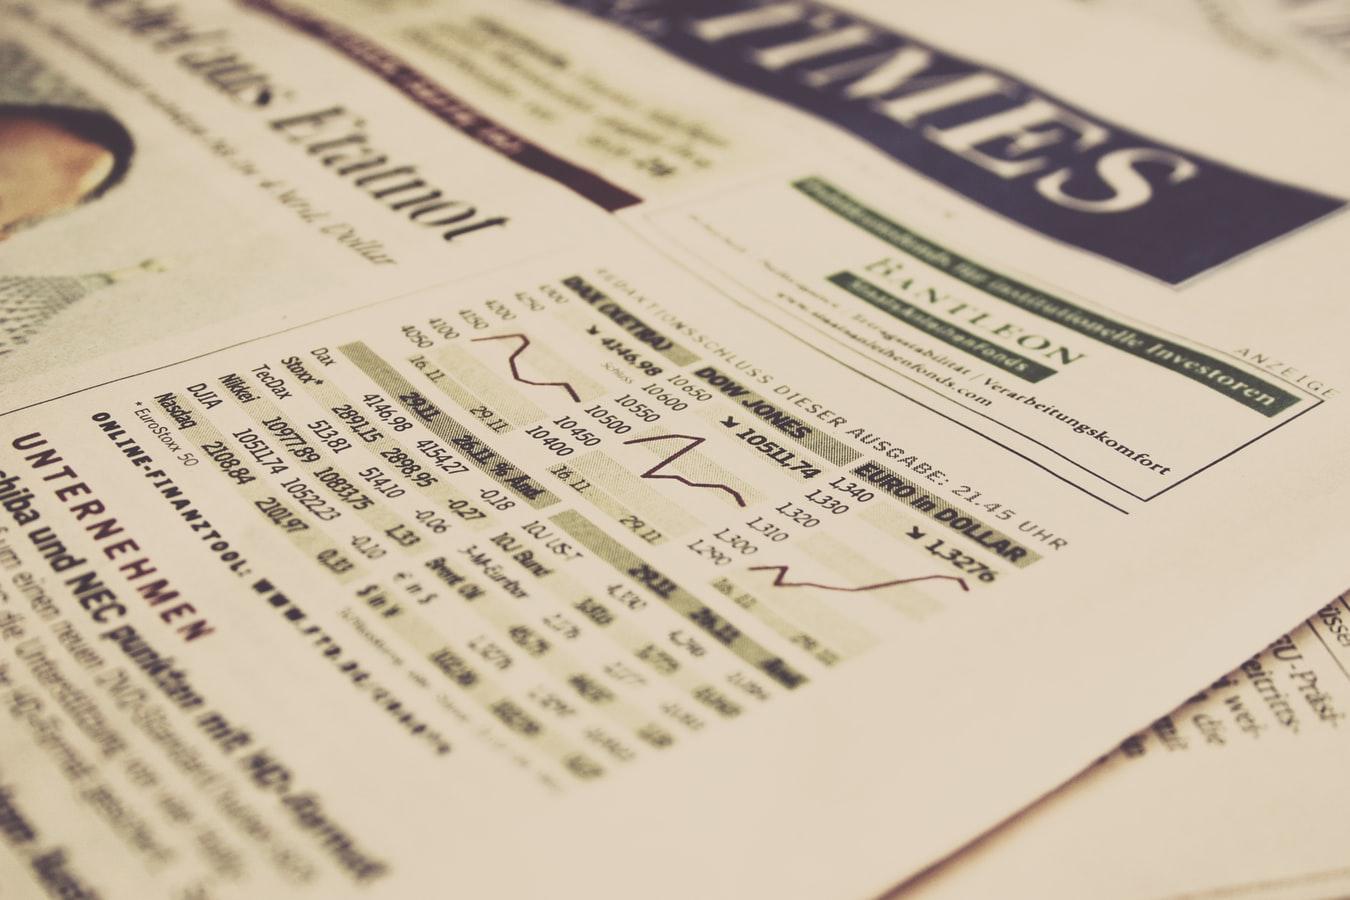 AGNC Investment Corp. Shares Near 52-Week High - Market Mover